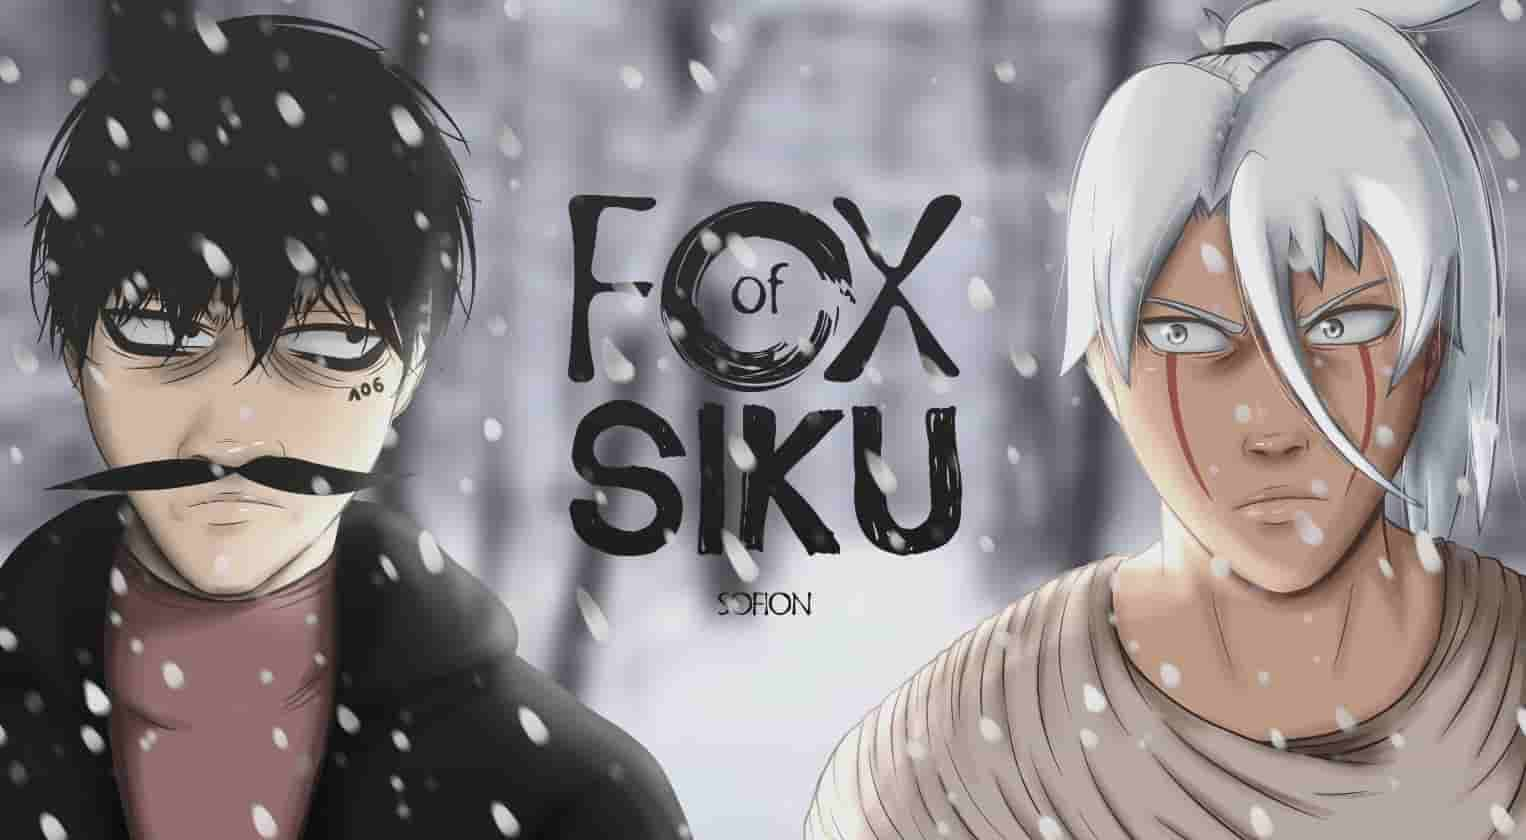 Fox of siku - scan gratuit manga en ligne manga scan gratuit bayday